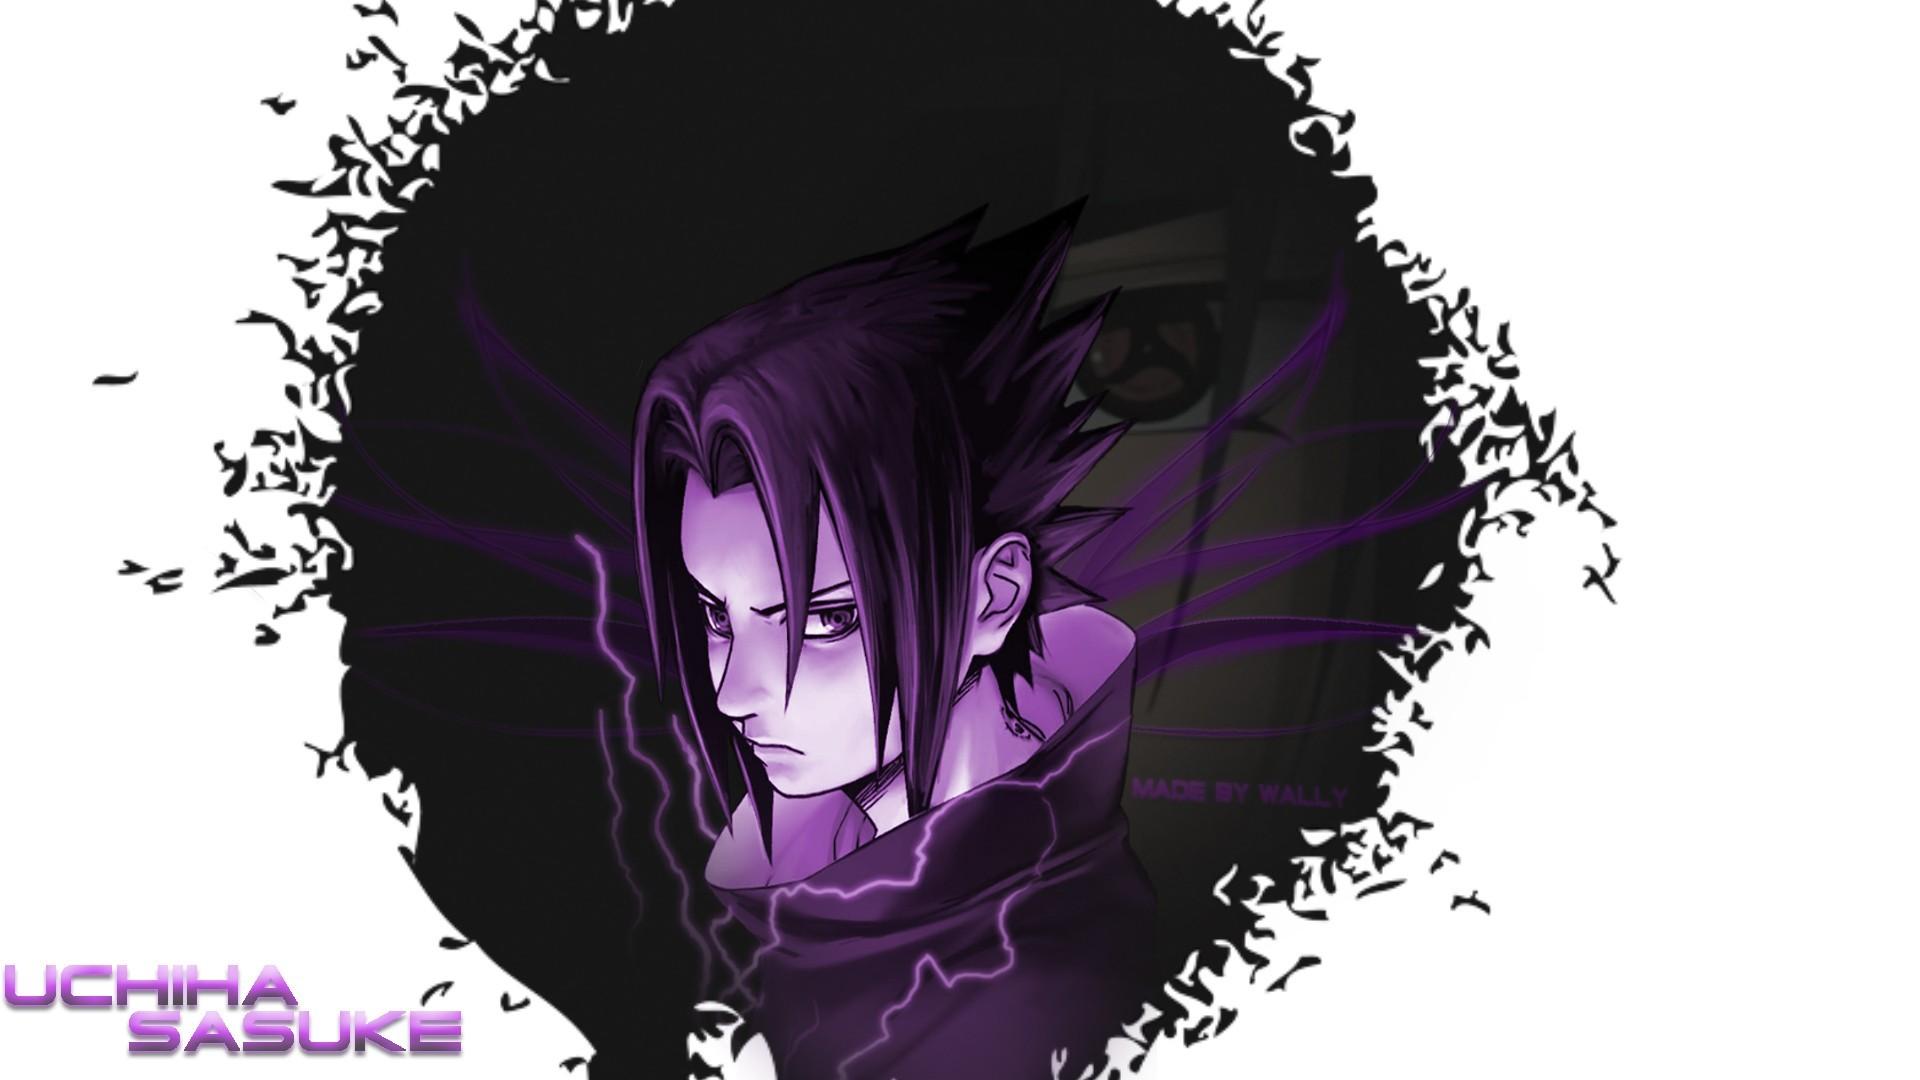 Sasuke Chidori Wallpaper 52 Images